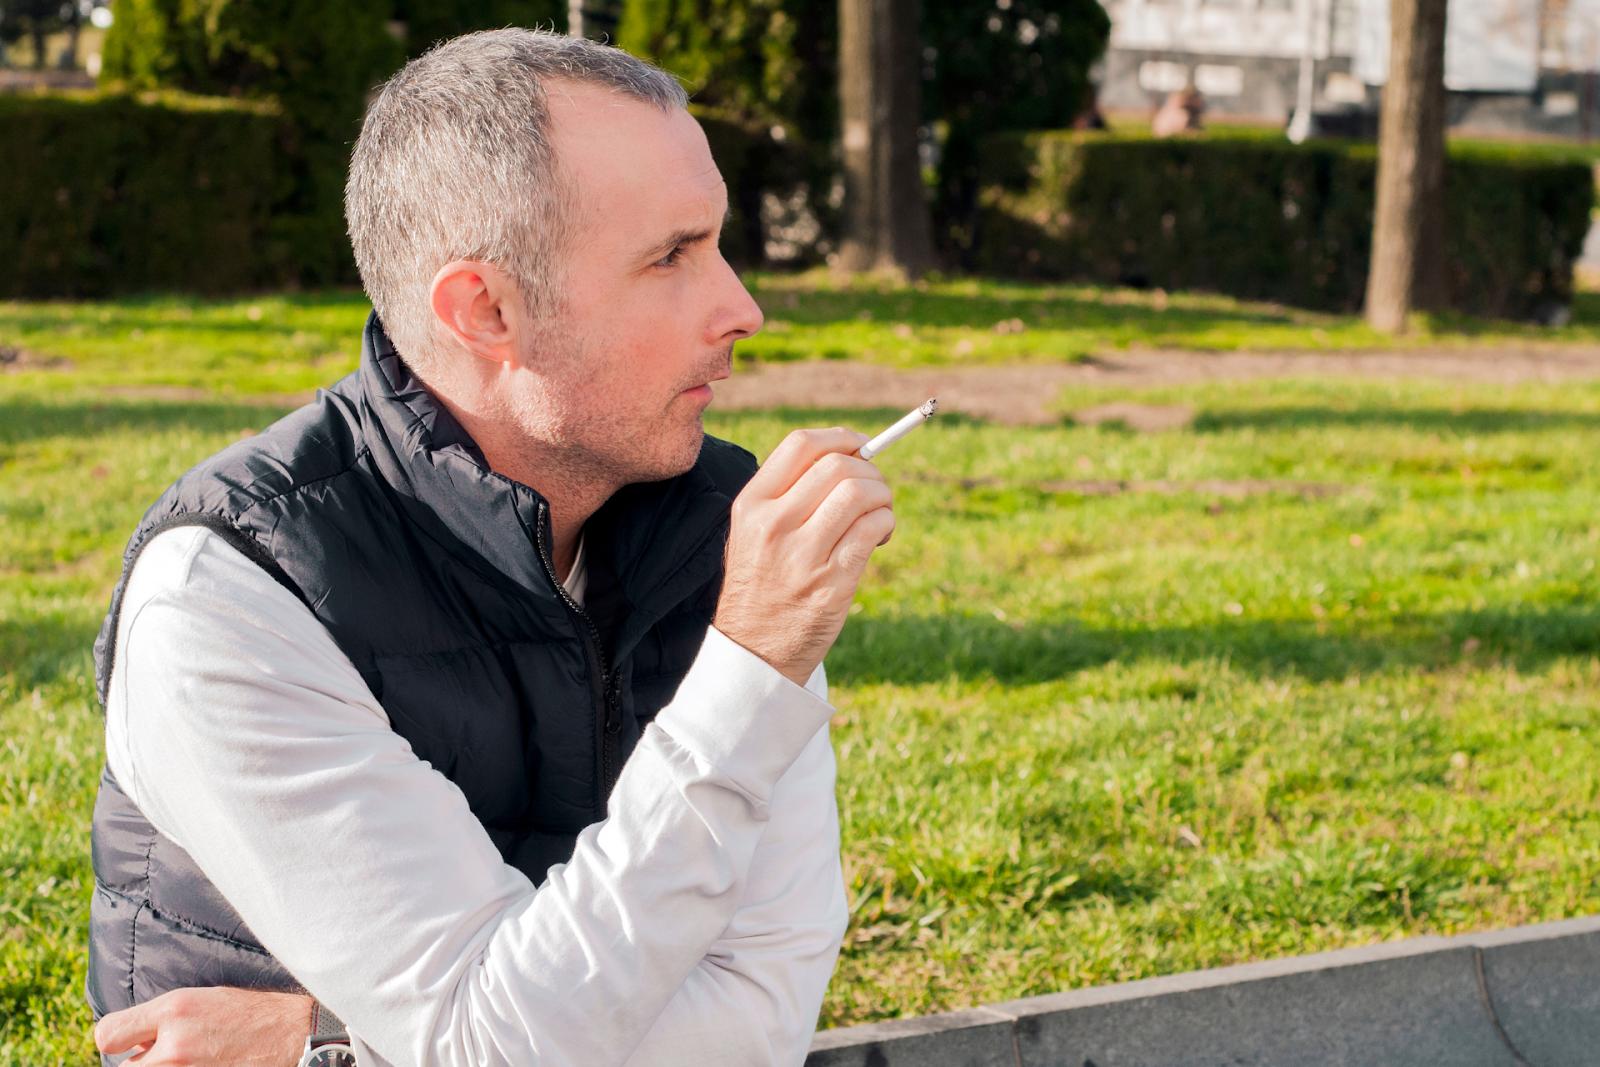 business man smoking sitting on a street sidewalk